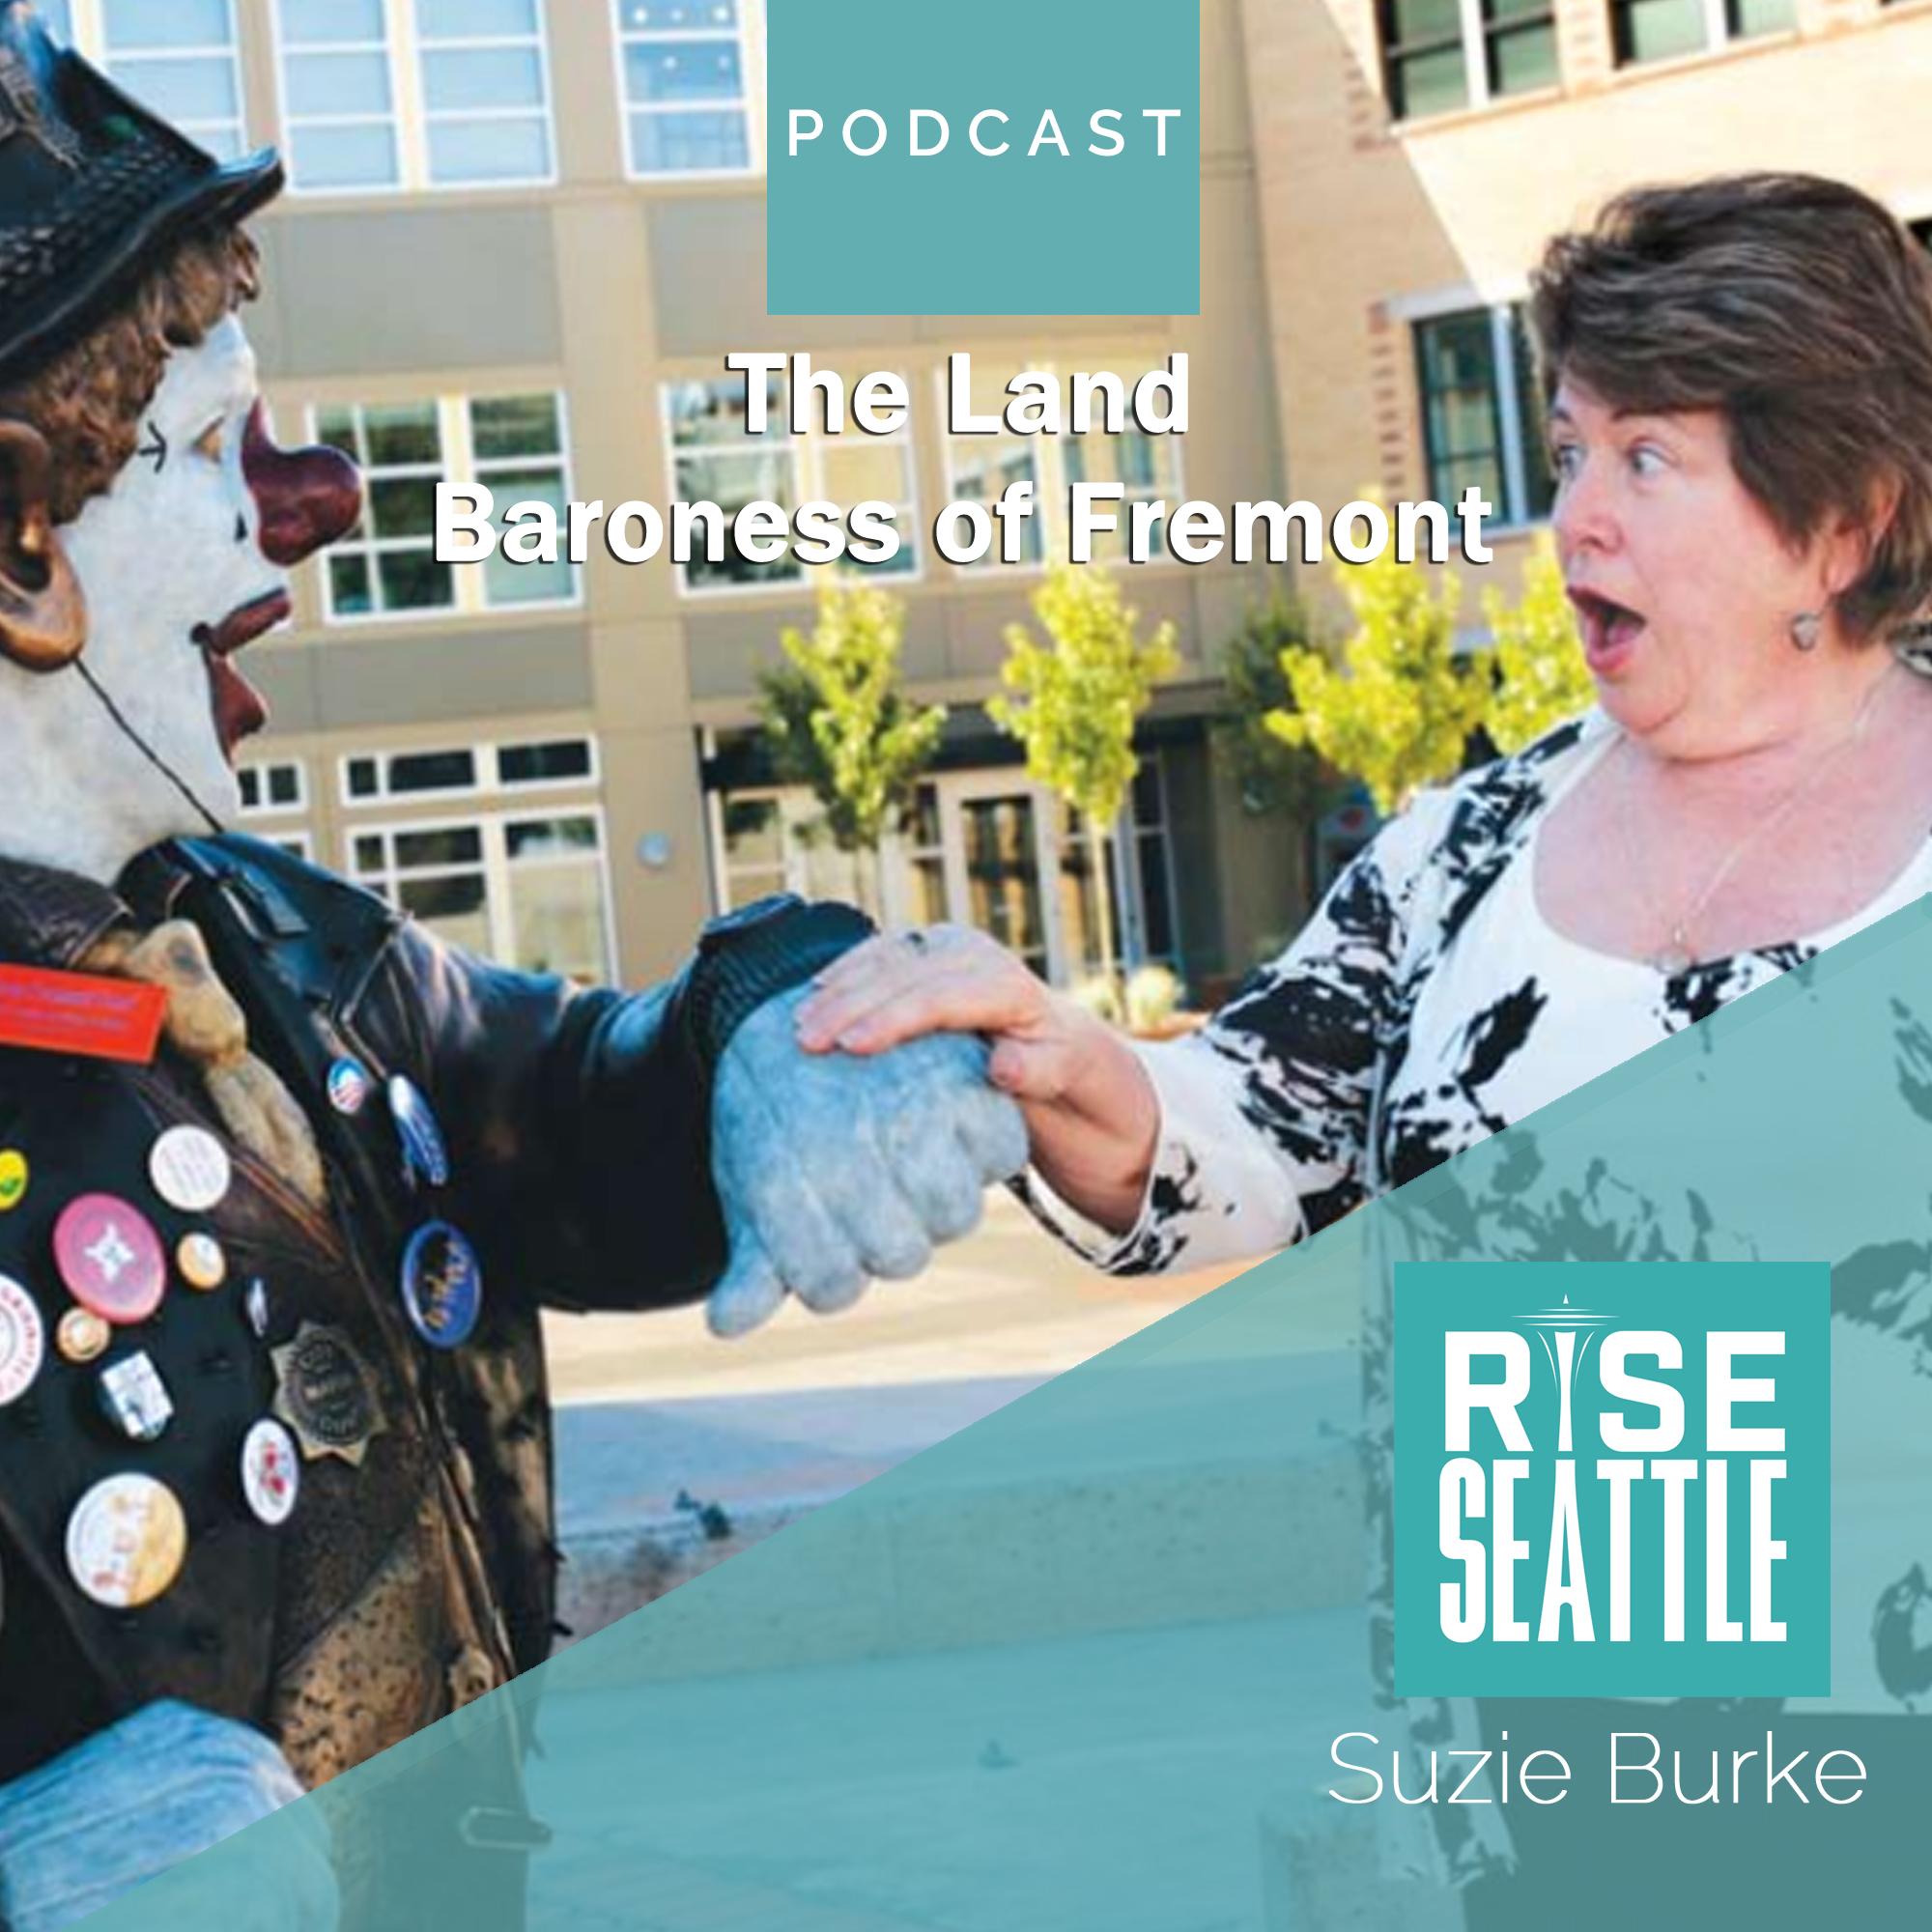 S1.E6. Suzie Burke: The Land Baroness of Fremont